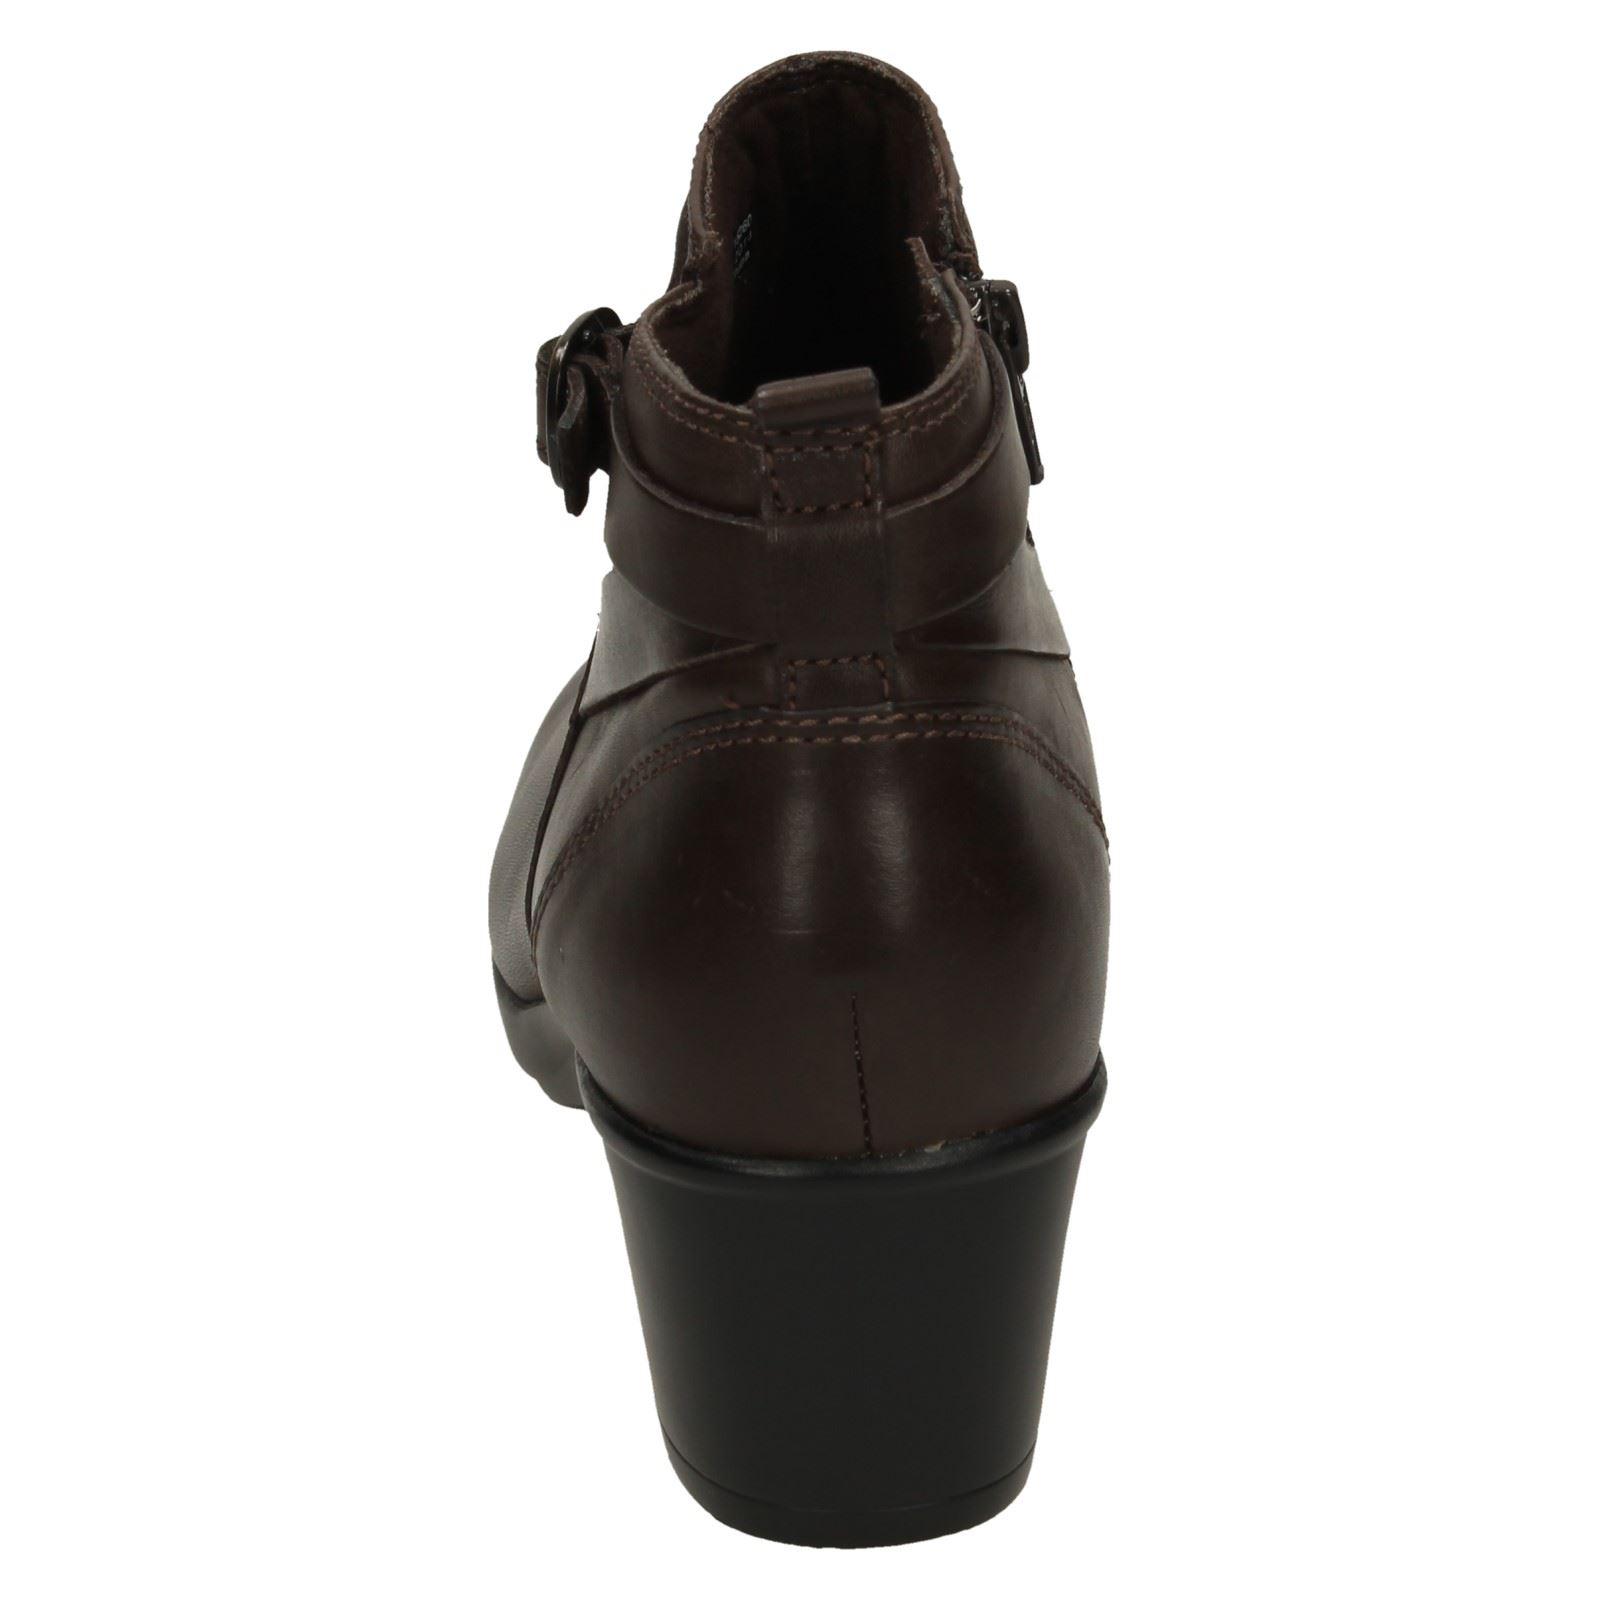 ead3bf94824 Ladies Clarks Low Heel Ankle Boots  Malia Hawthorn